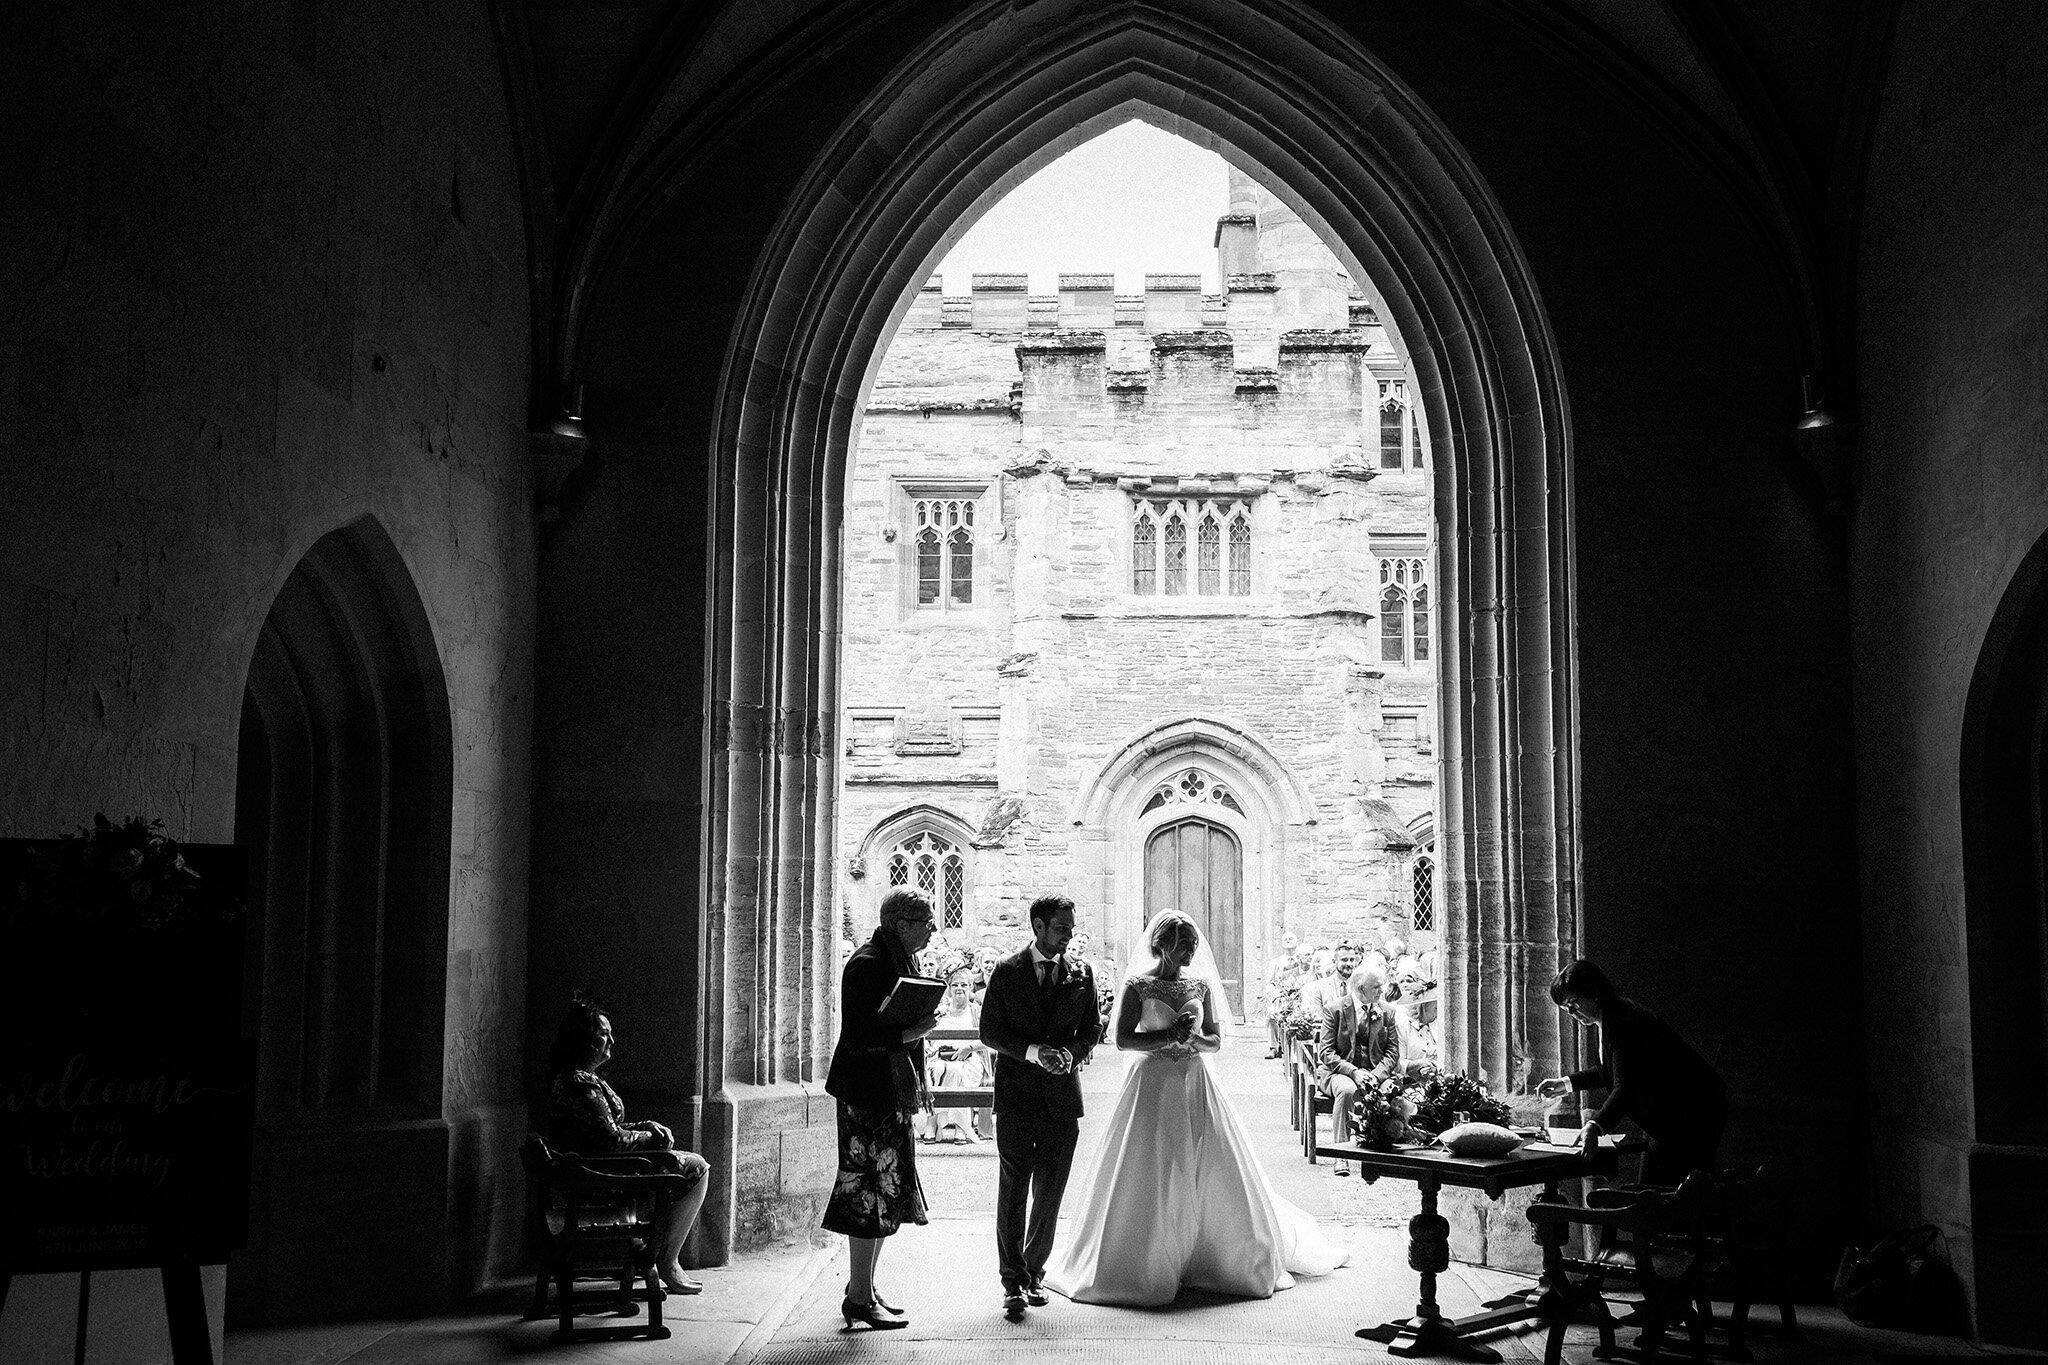 Scott-Stockwell-Photography-wedding-photographer-hampton-court-castle-sarah-james.jpg